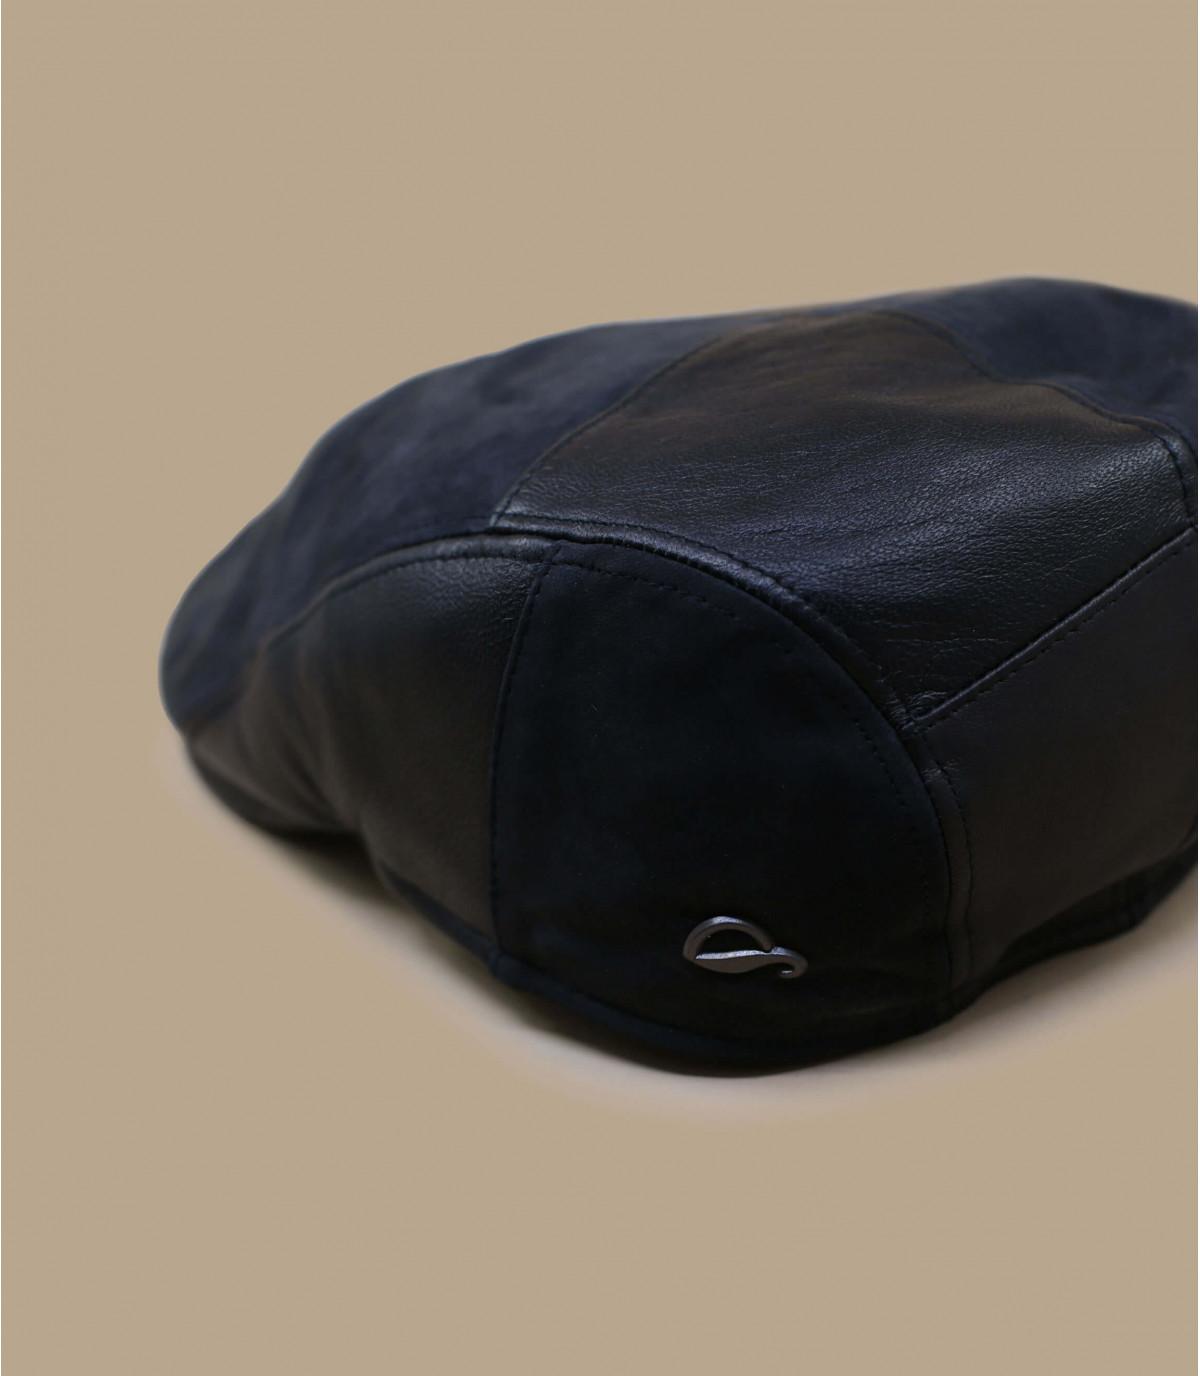 Detalles Brighton Patchwork Leather black imagen 2